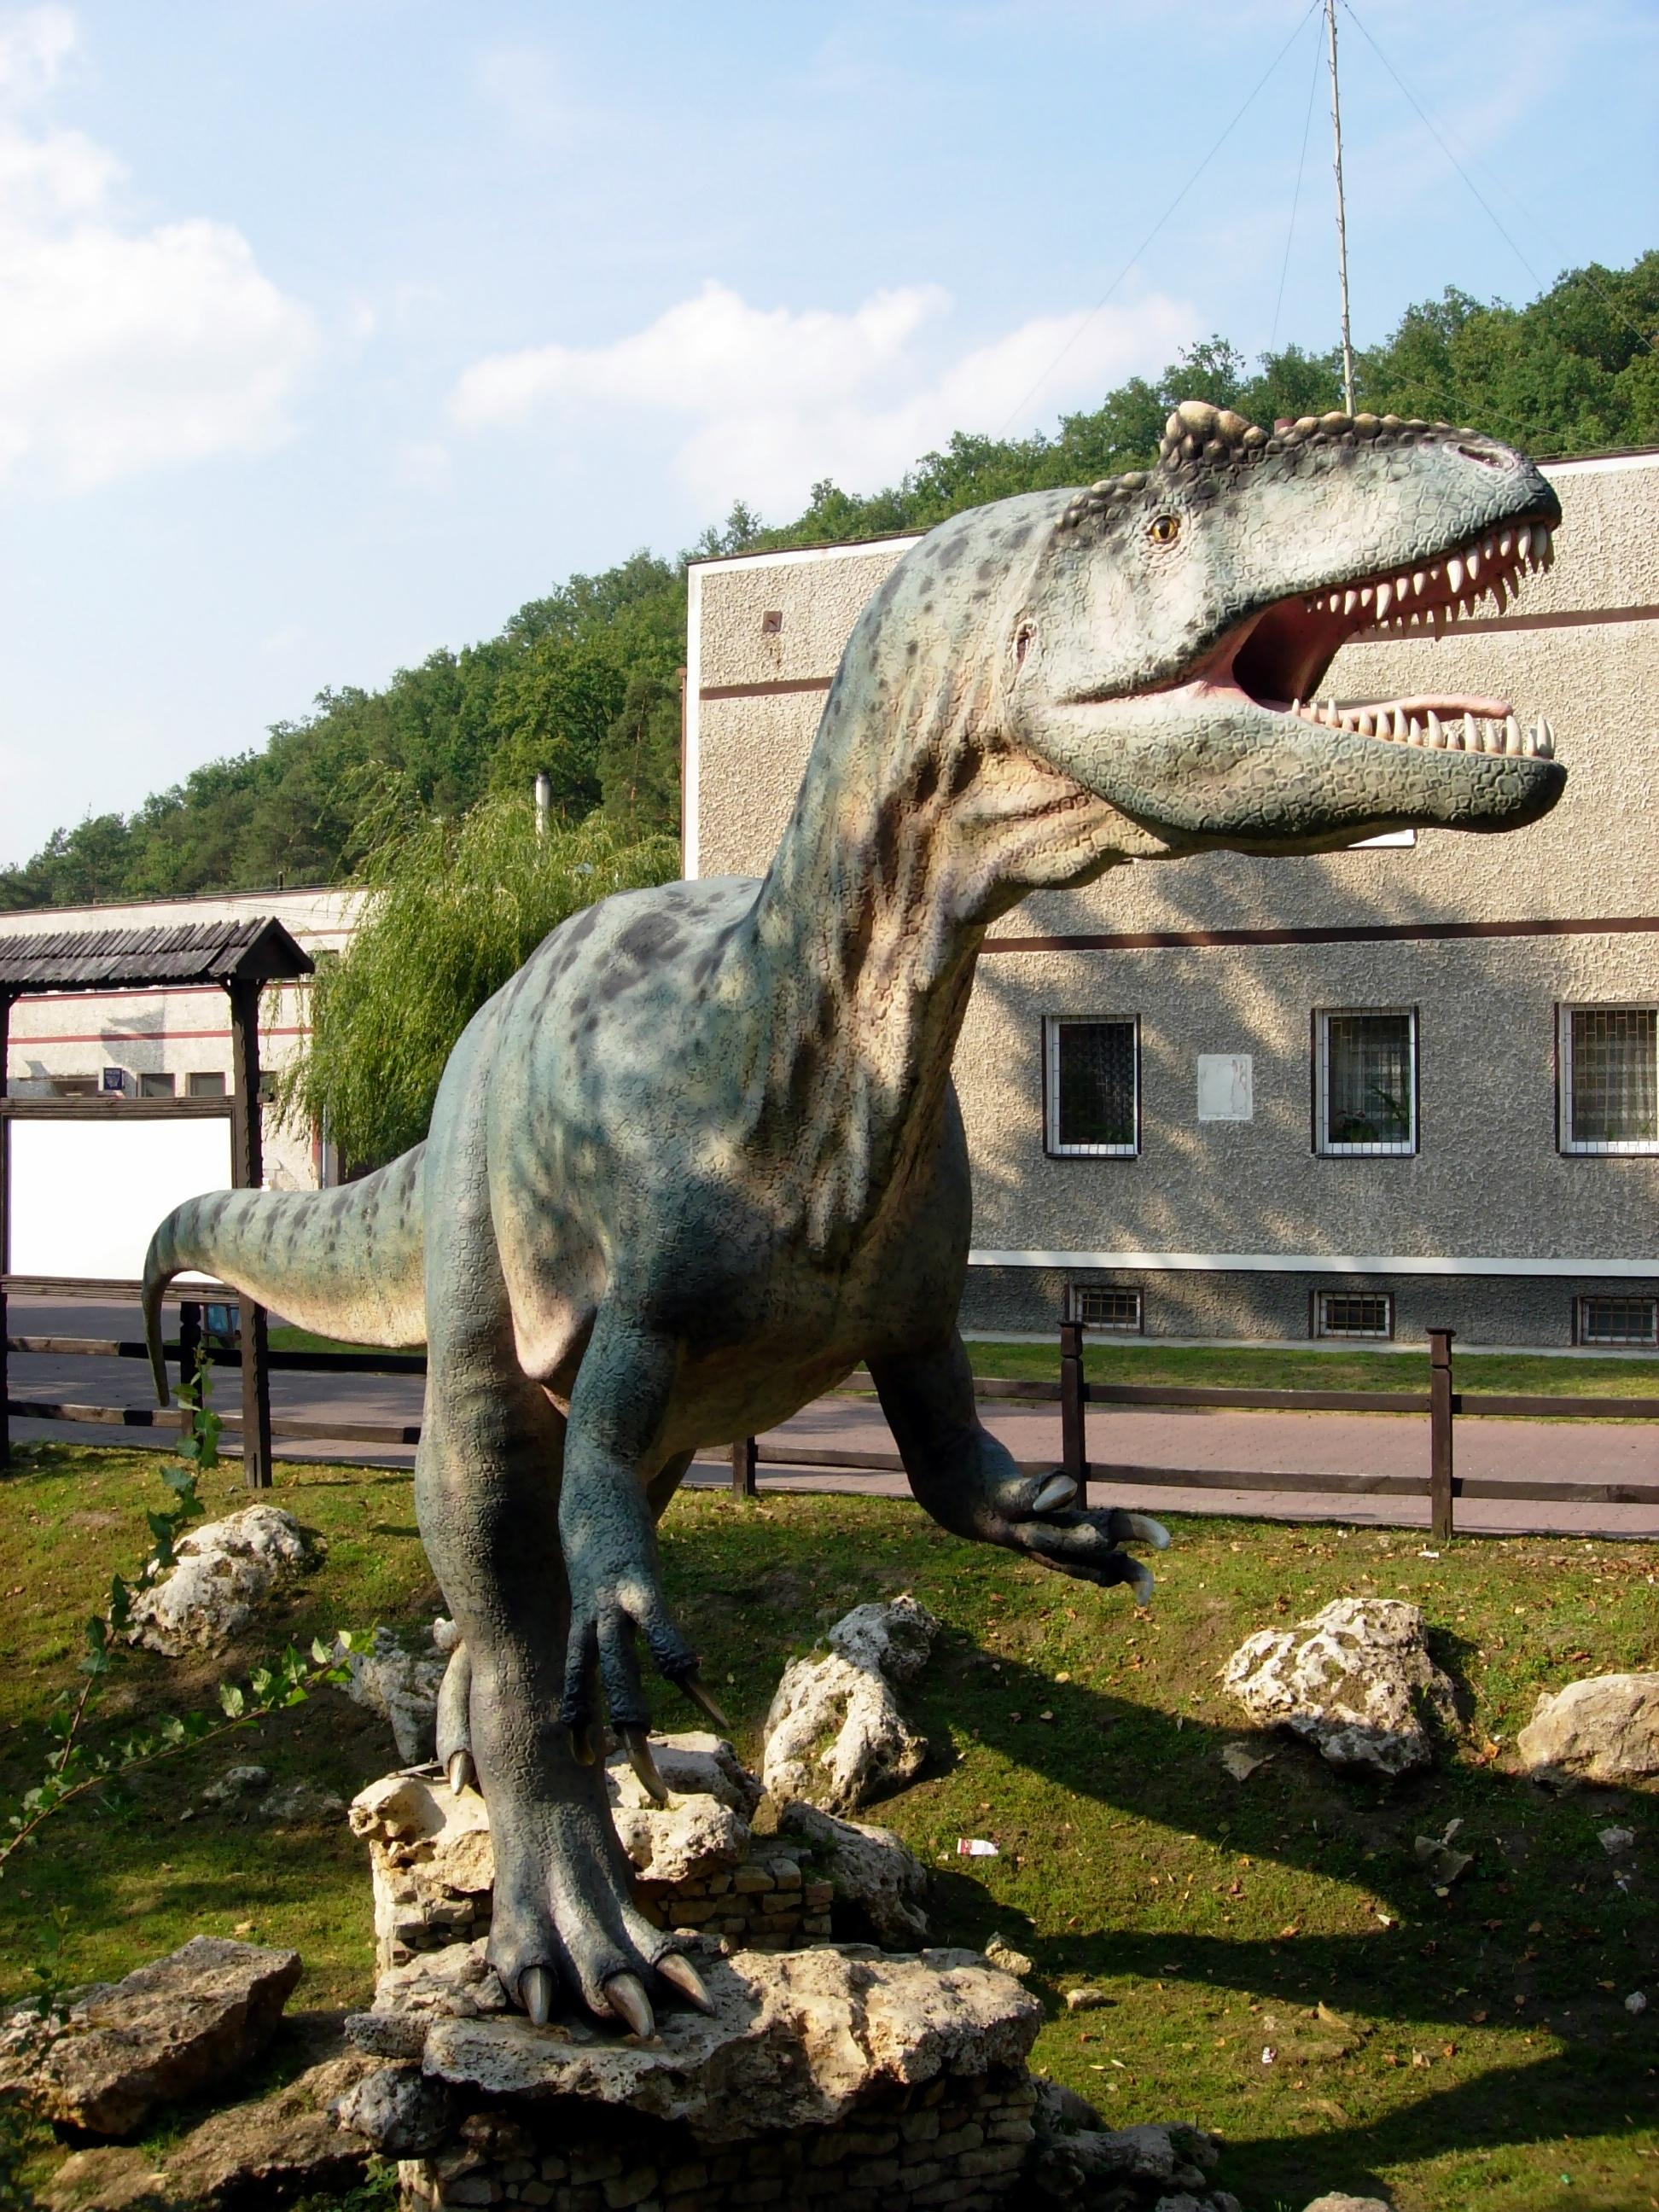 O expozitie inedita cu dinozauri robotizati, ajunge la Timisoara.Vezi cand ii poti vizita